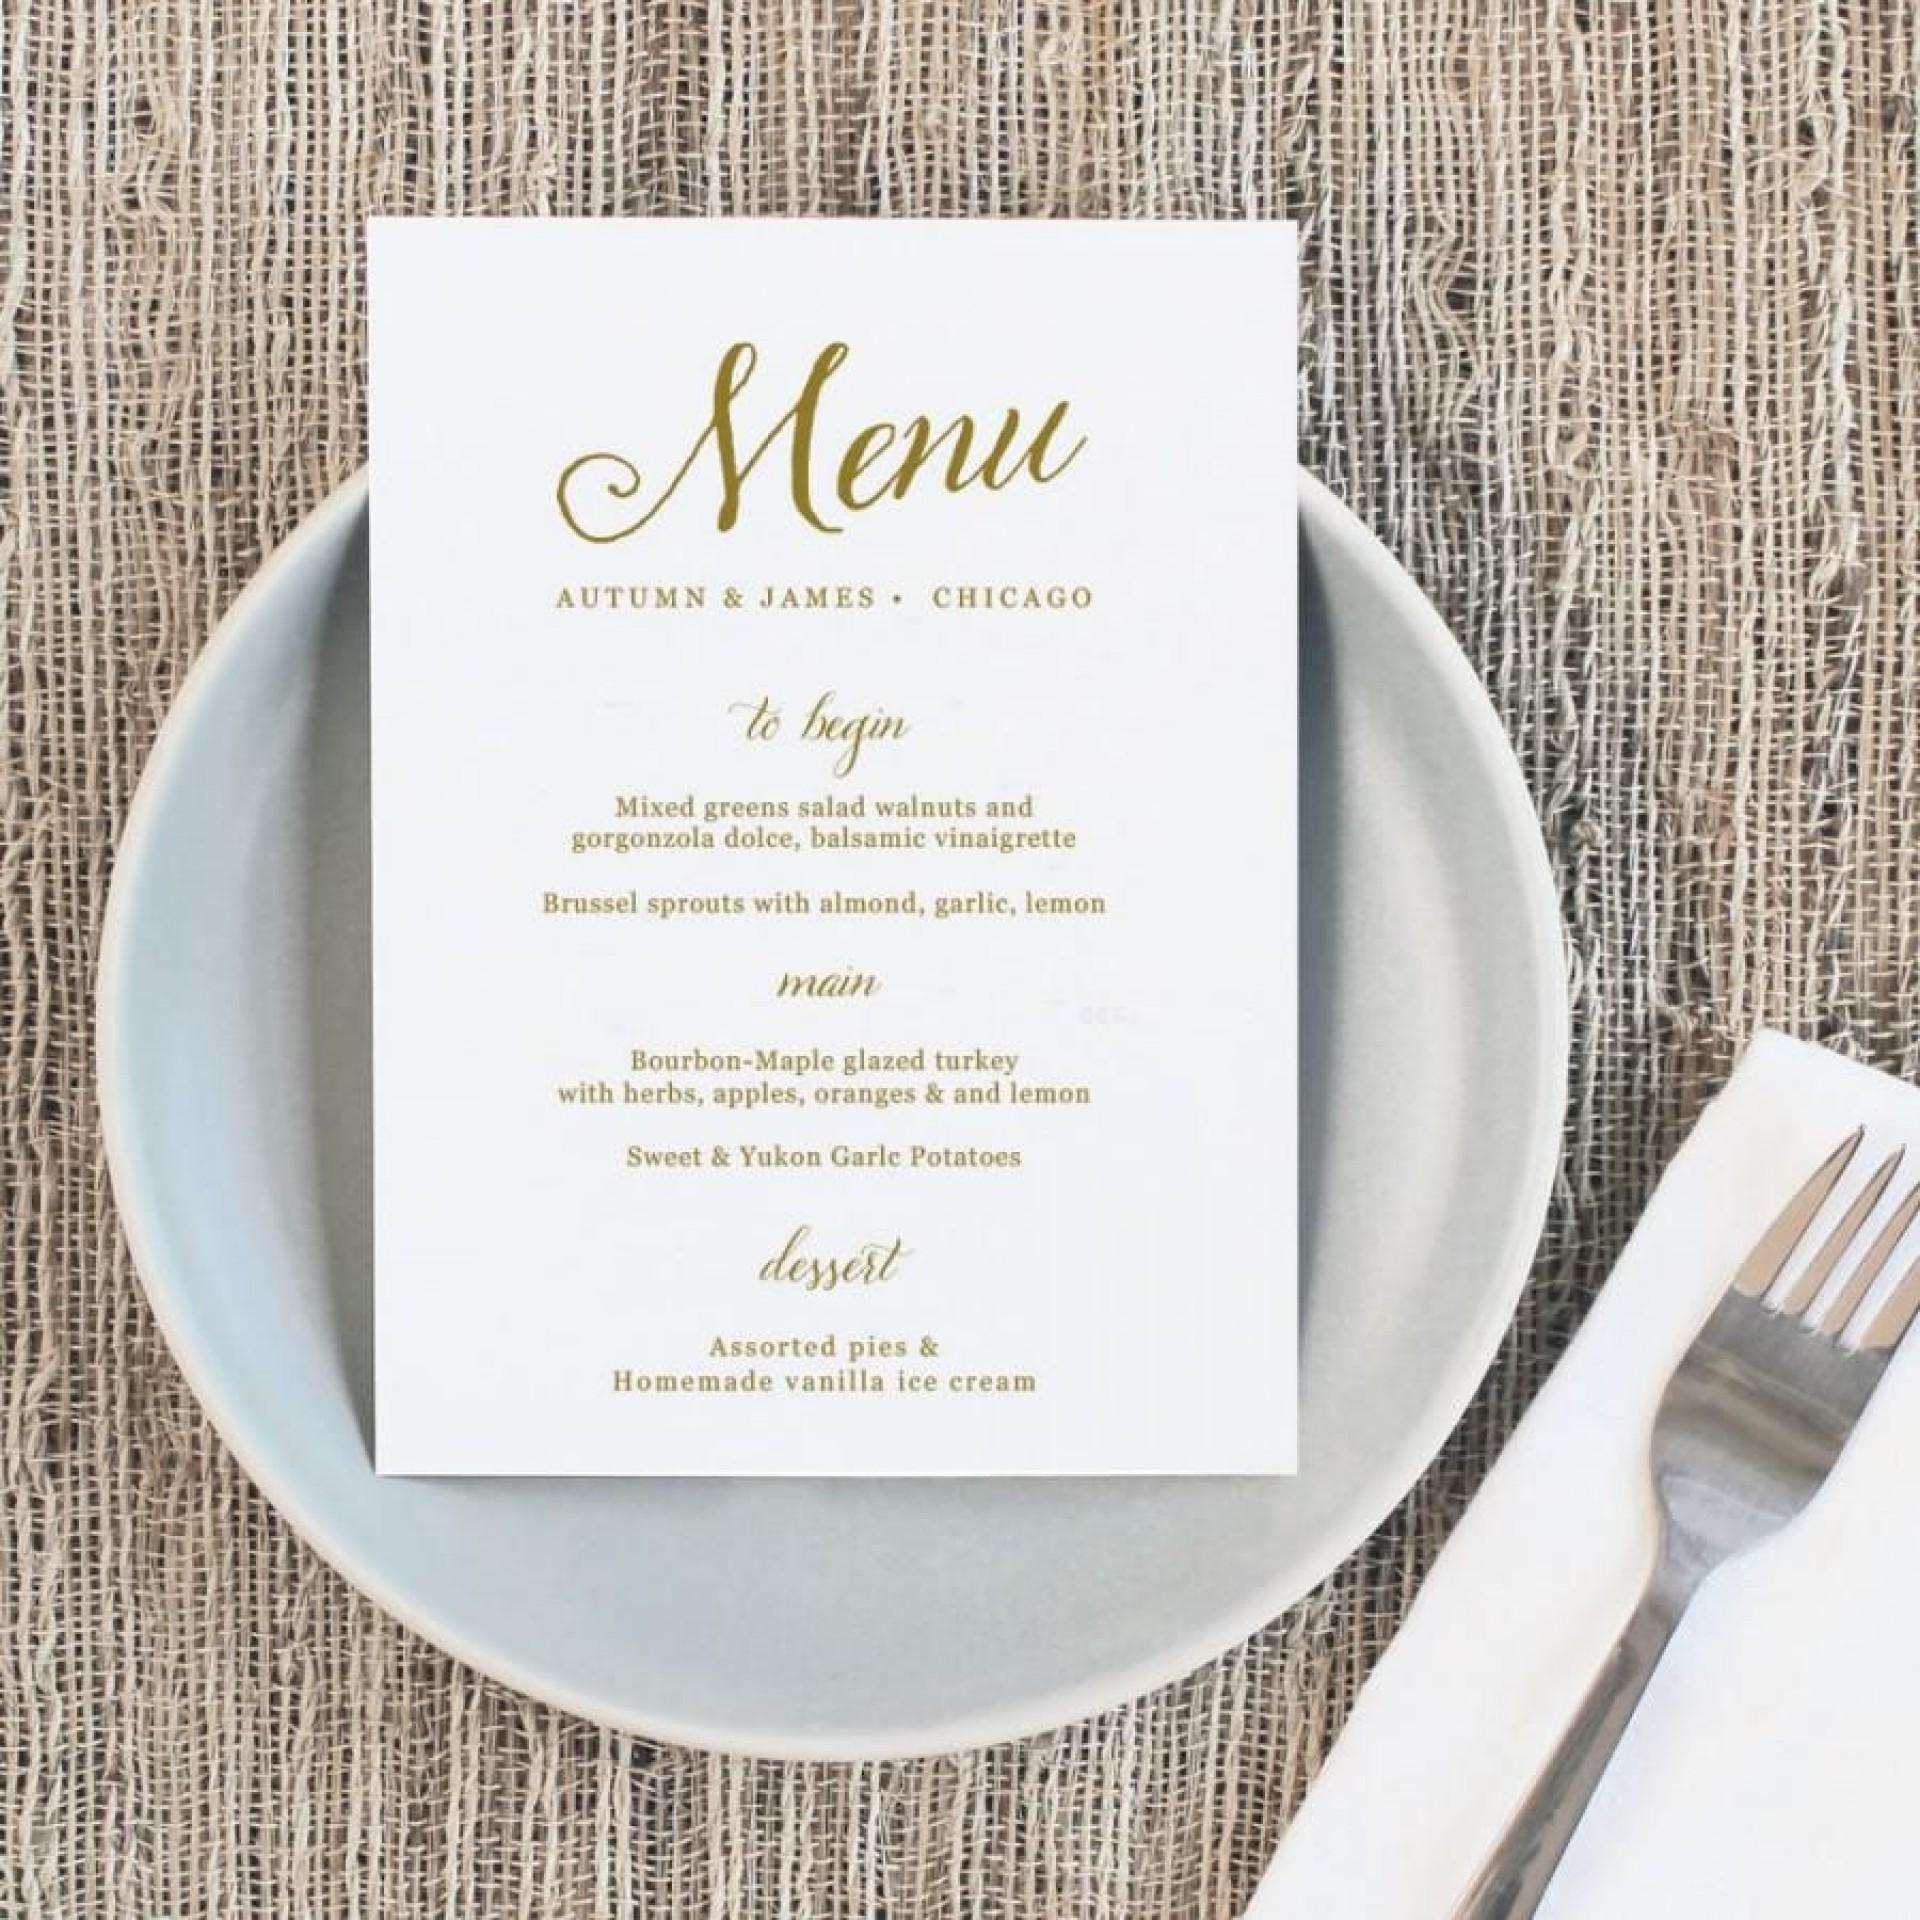 008 Astounding Free Online Wedding Menu Template Sample  Templates1920